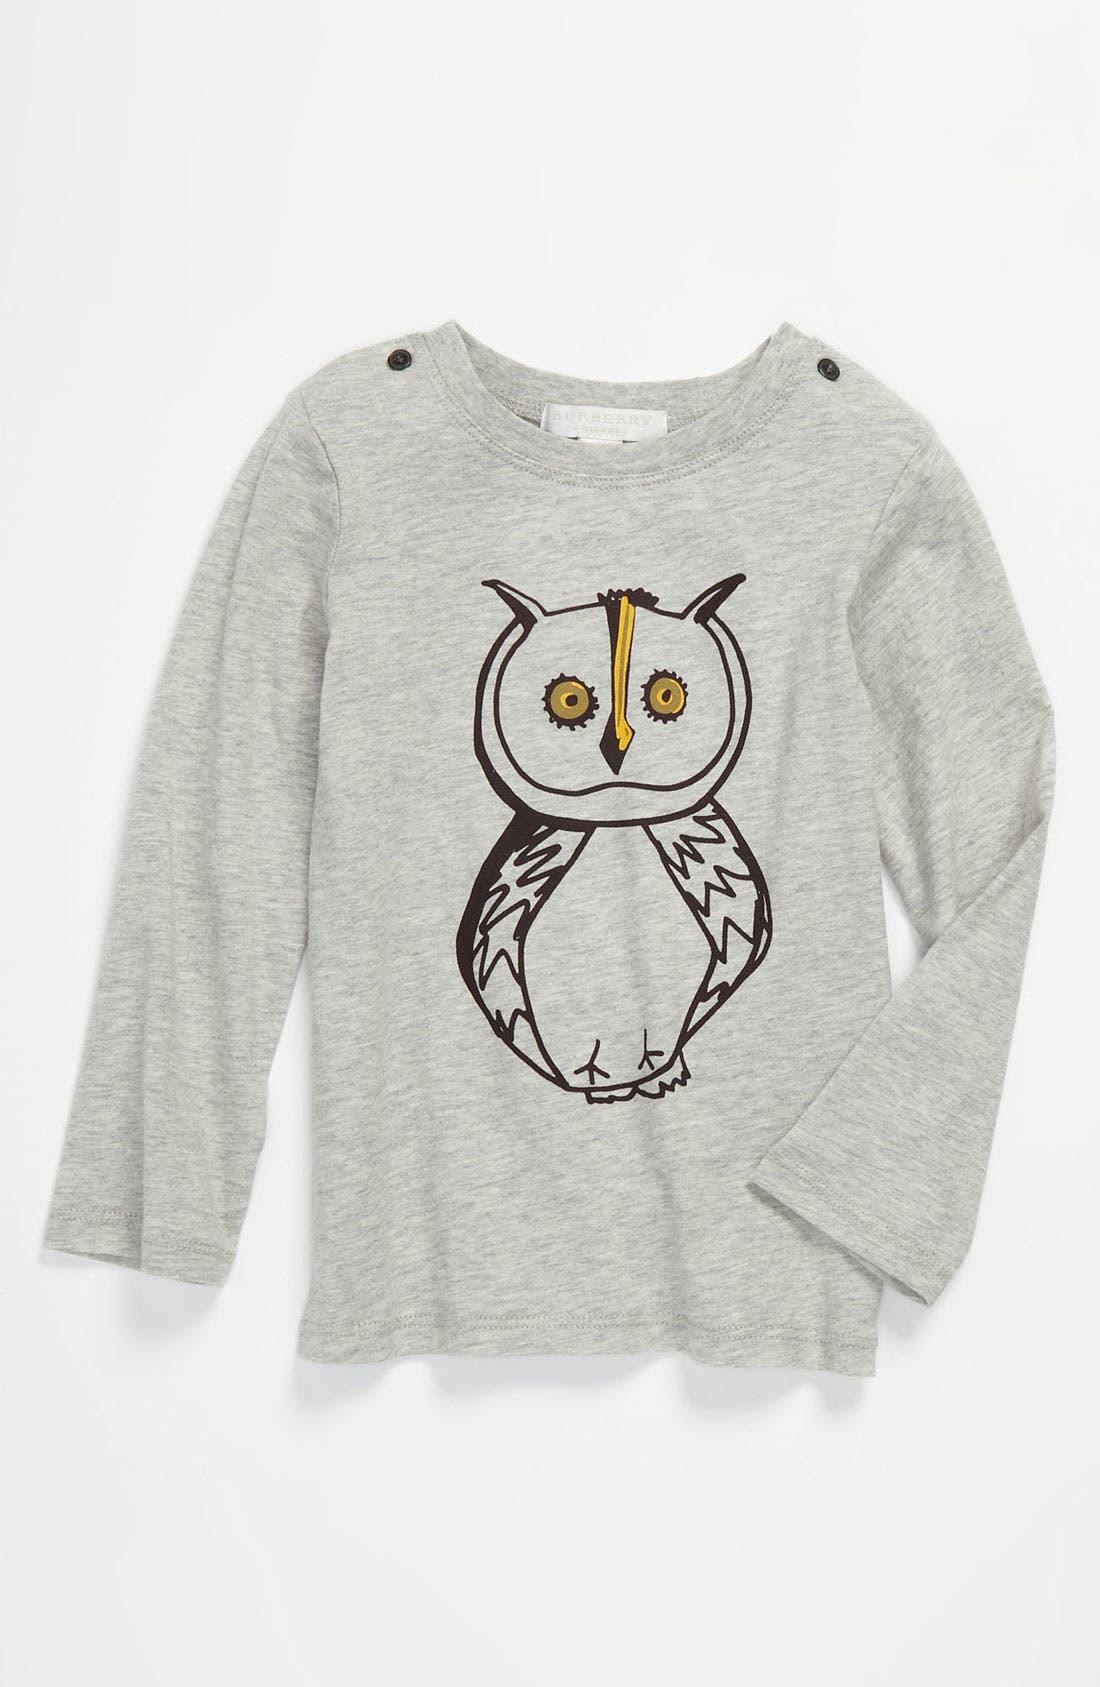 Alternate Image 1 Selected - Burberry Owl Print Tee (Infant)